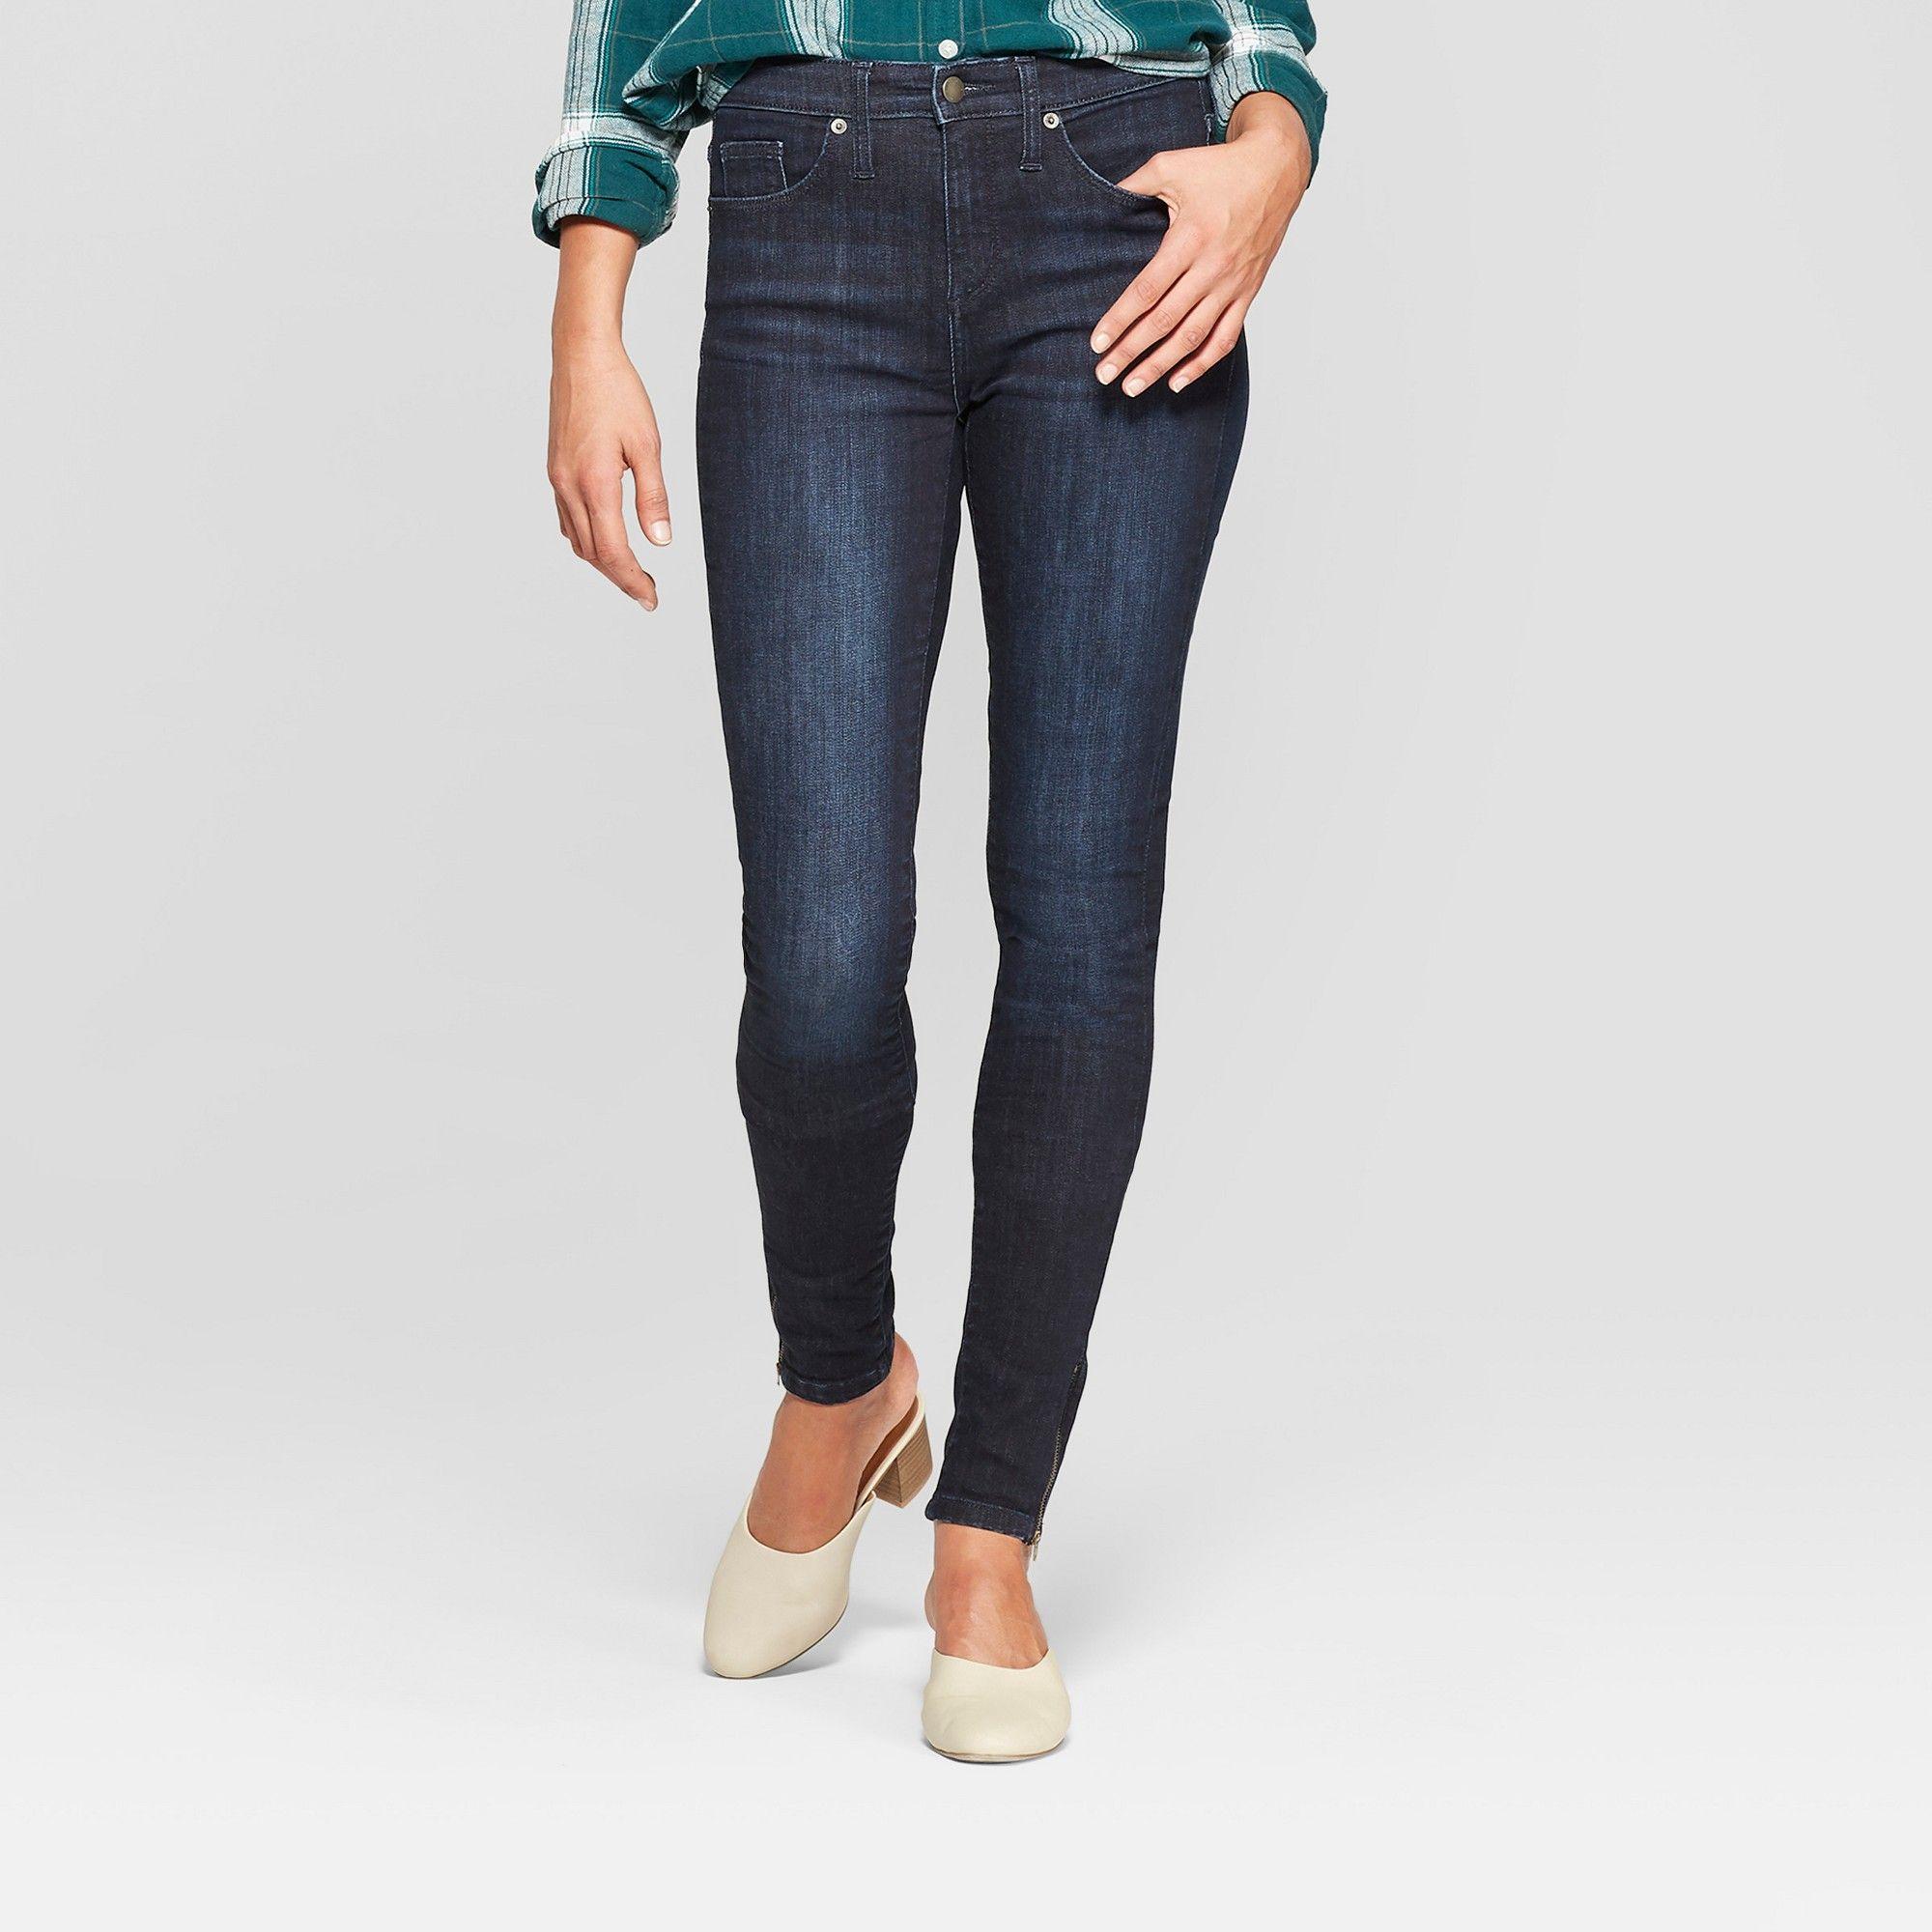 01d80e536a6f Women's High-Rise Zippered Split Hem Skinny Jeans - Universal Thread Dark  Wash 10 Short, Blue